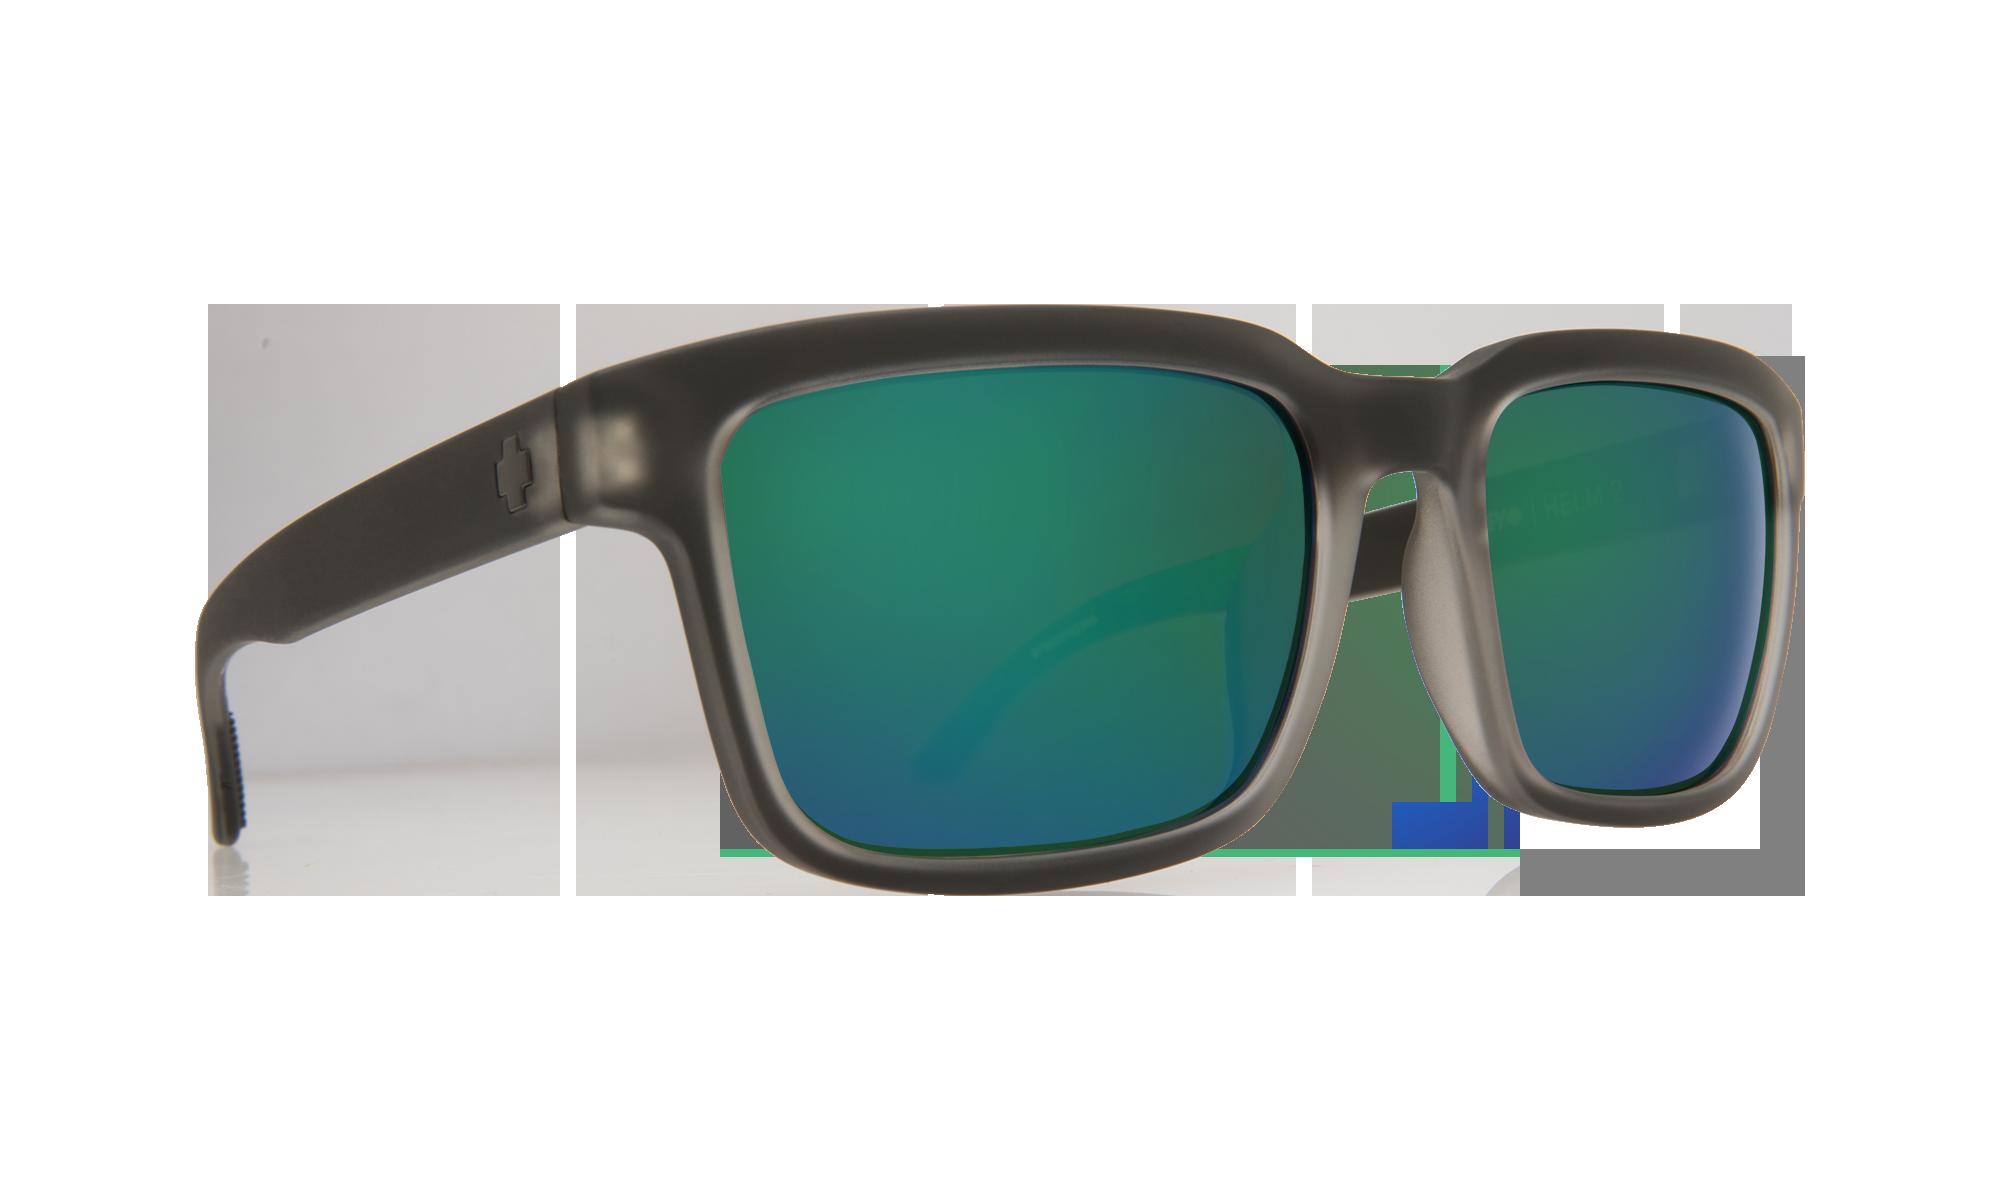 eb9194557a5ac Spy Optic Helm 2 Eyewear - Unisex - Sunglasses FREE S H 673520973365 ...